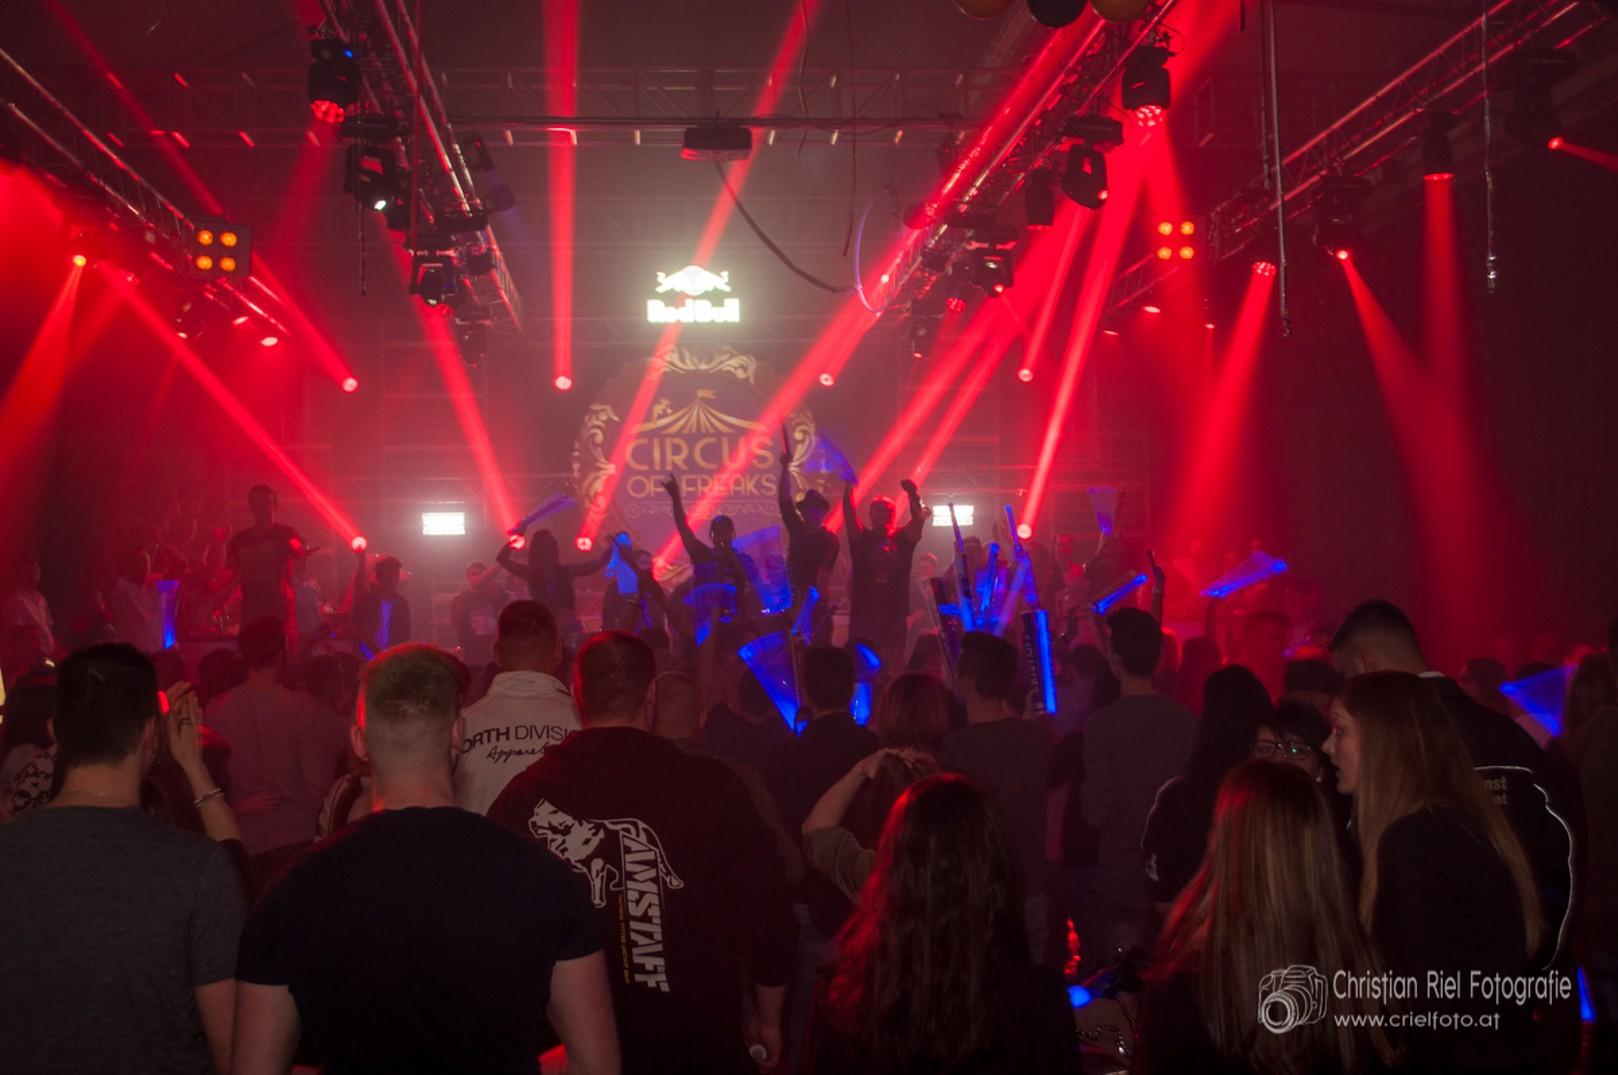 20170422 CircusofFreaks 11 -  - Feelon Media&Entertainment - Event & Werbeagentur